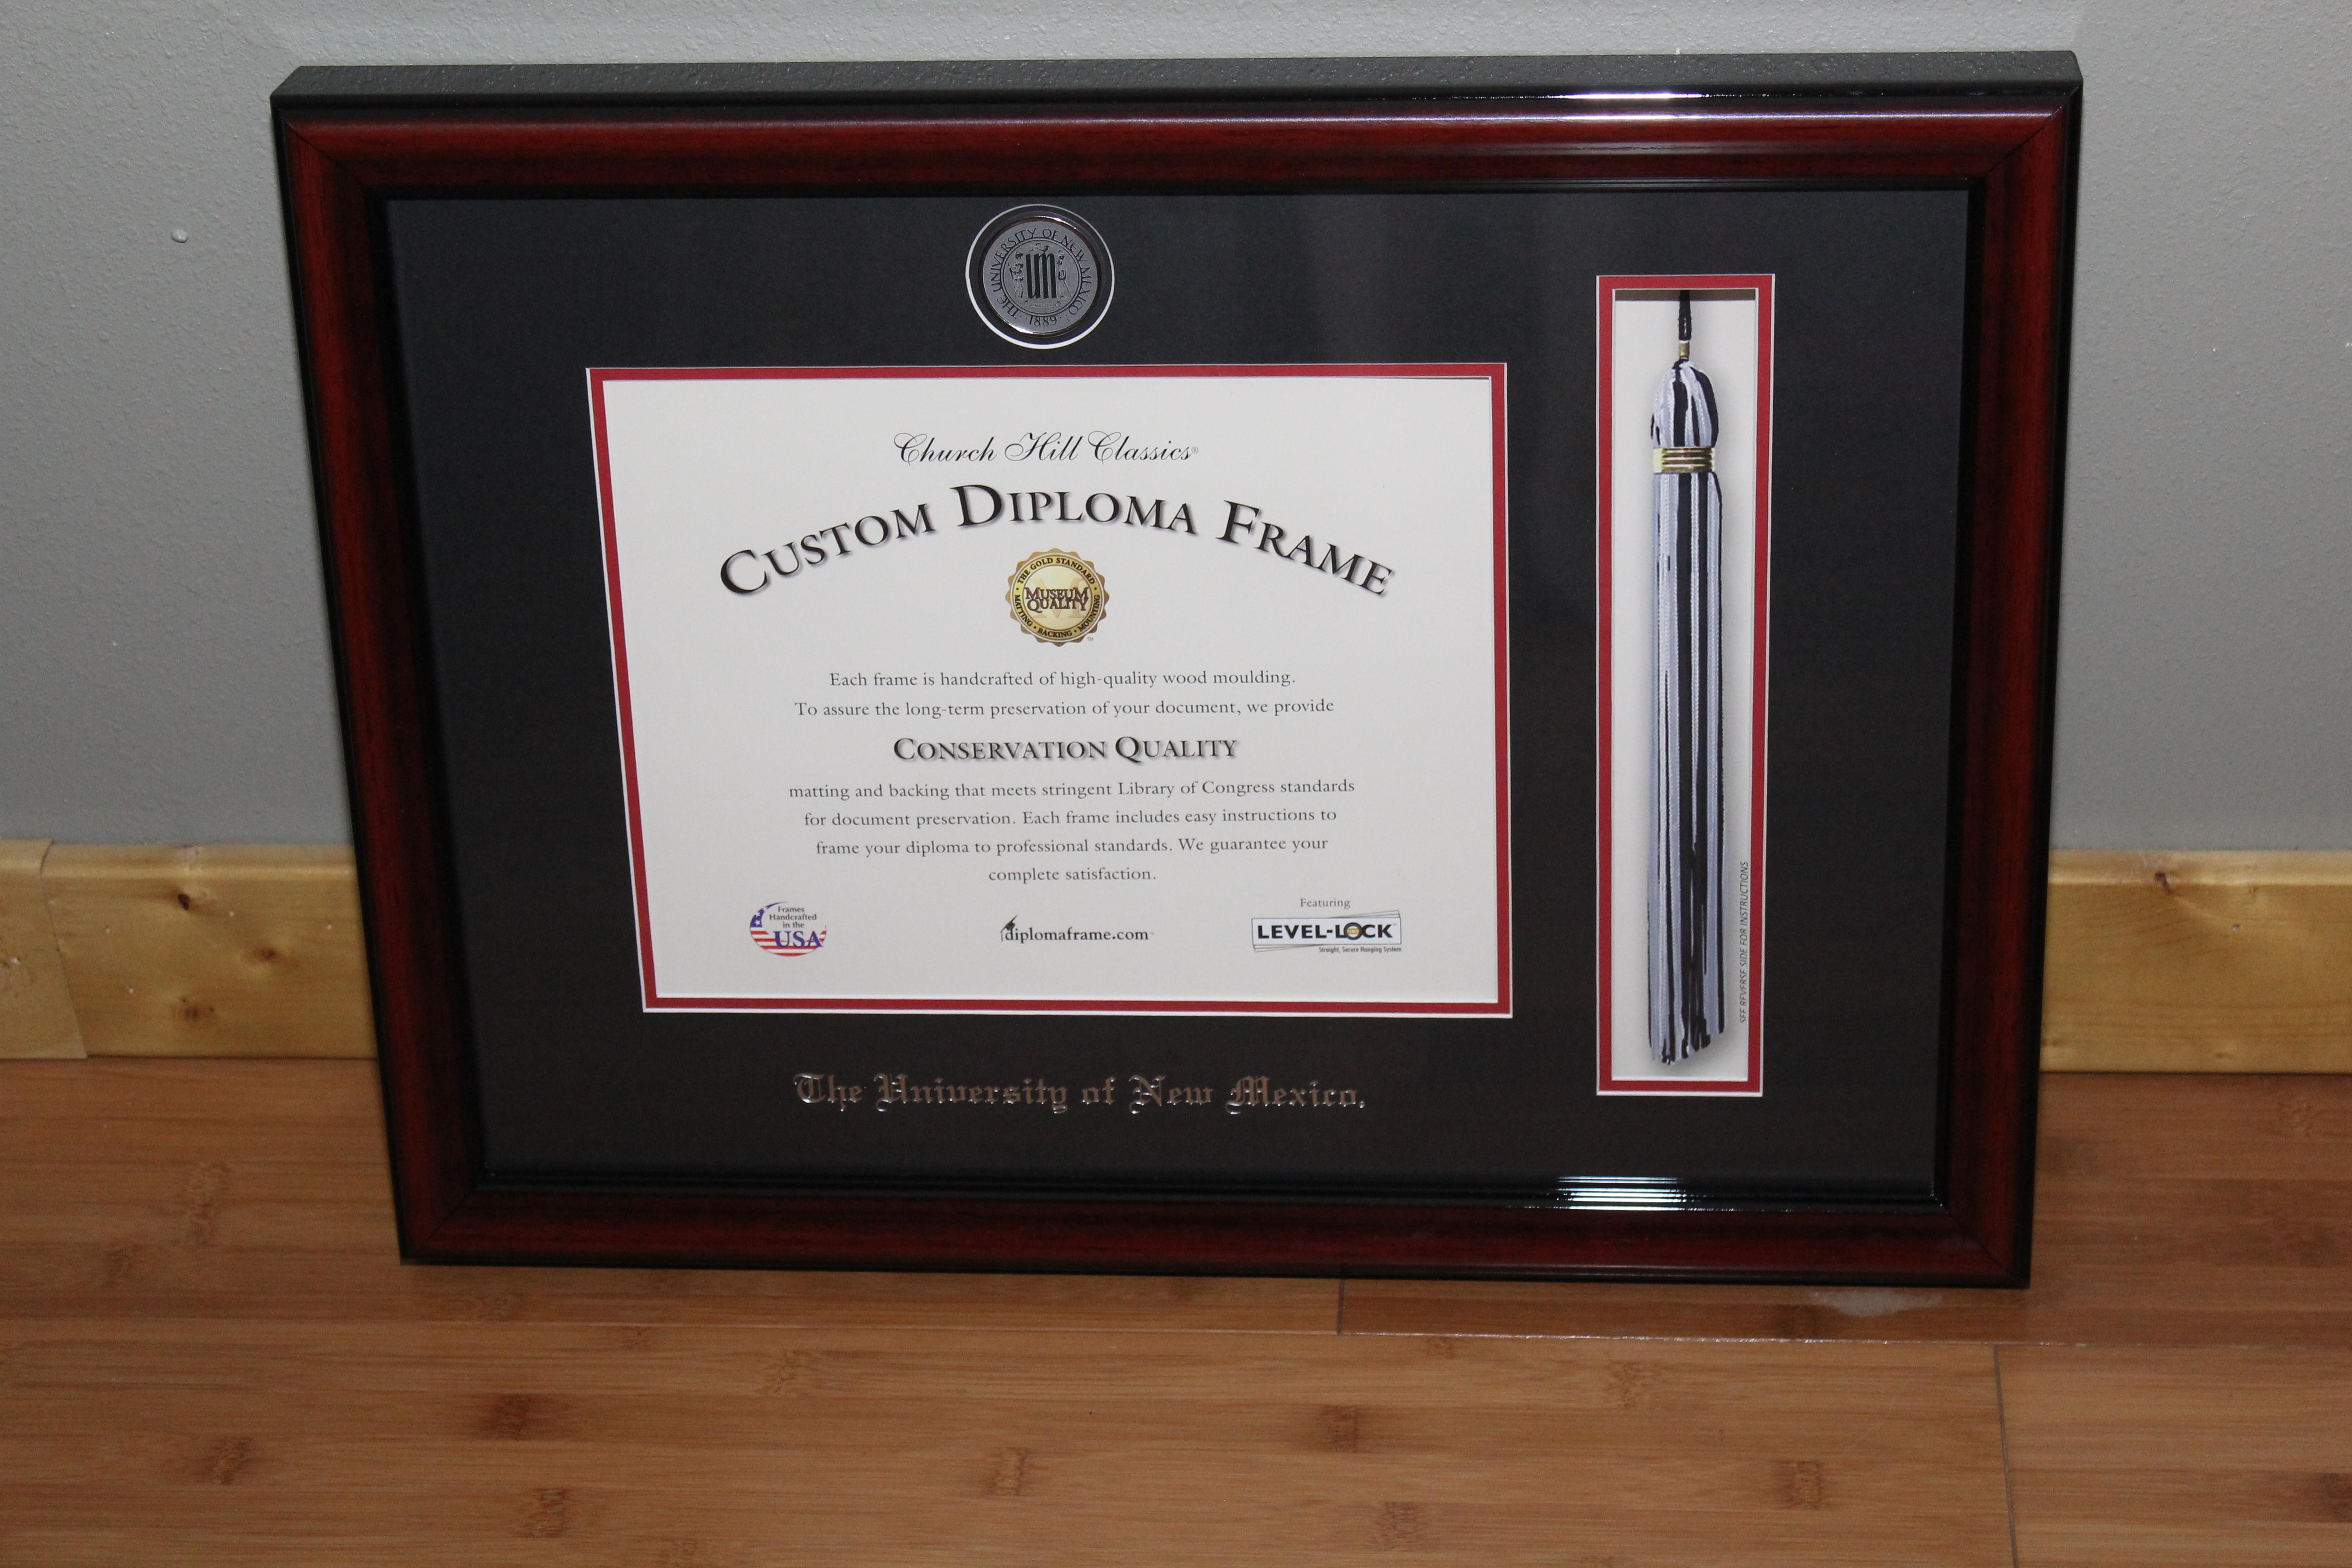 custom diploma frames by church hill classics